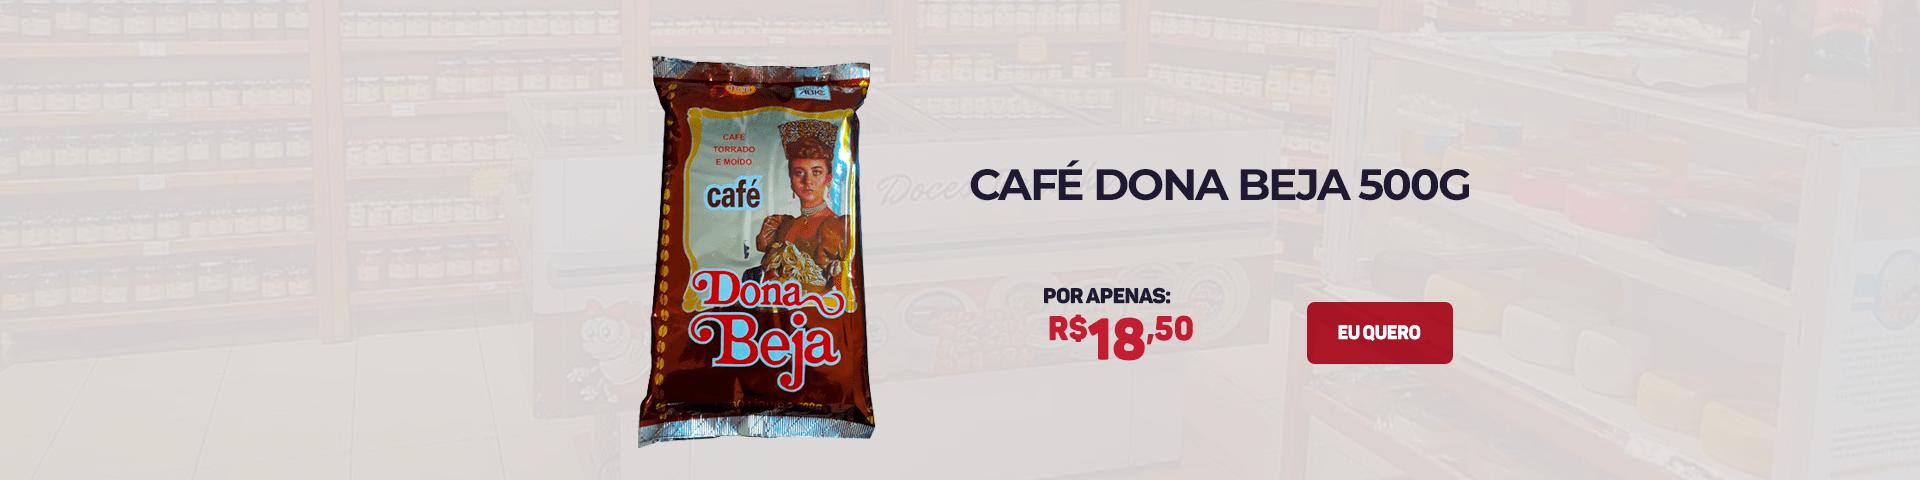 Café dona Beja banner